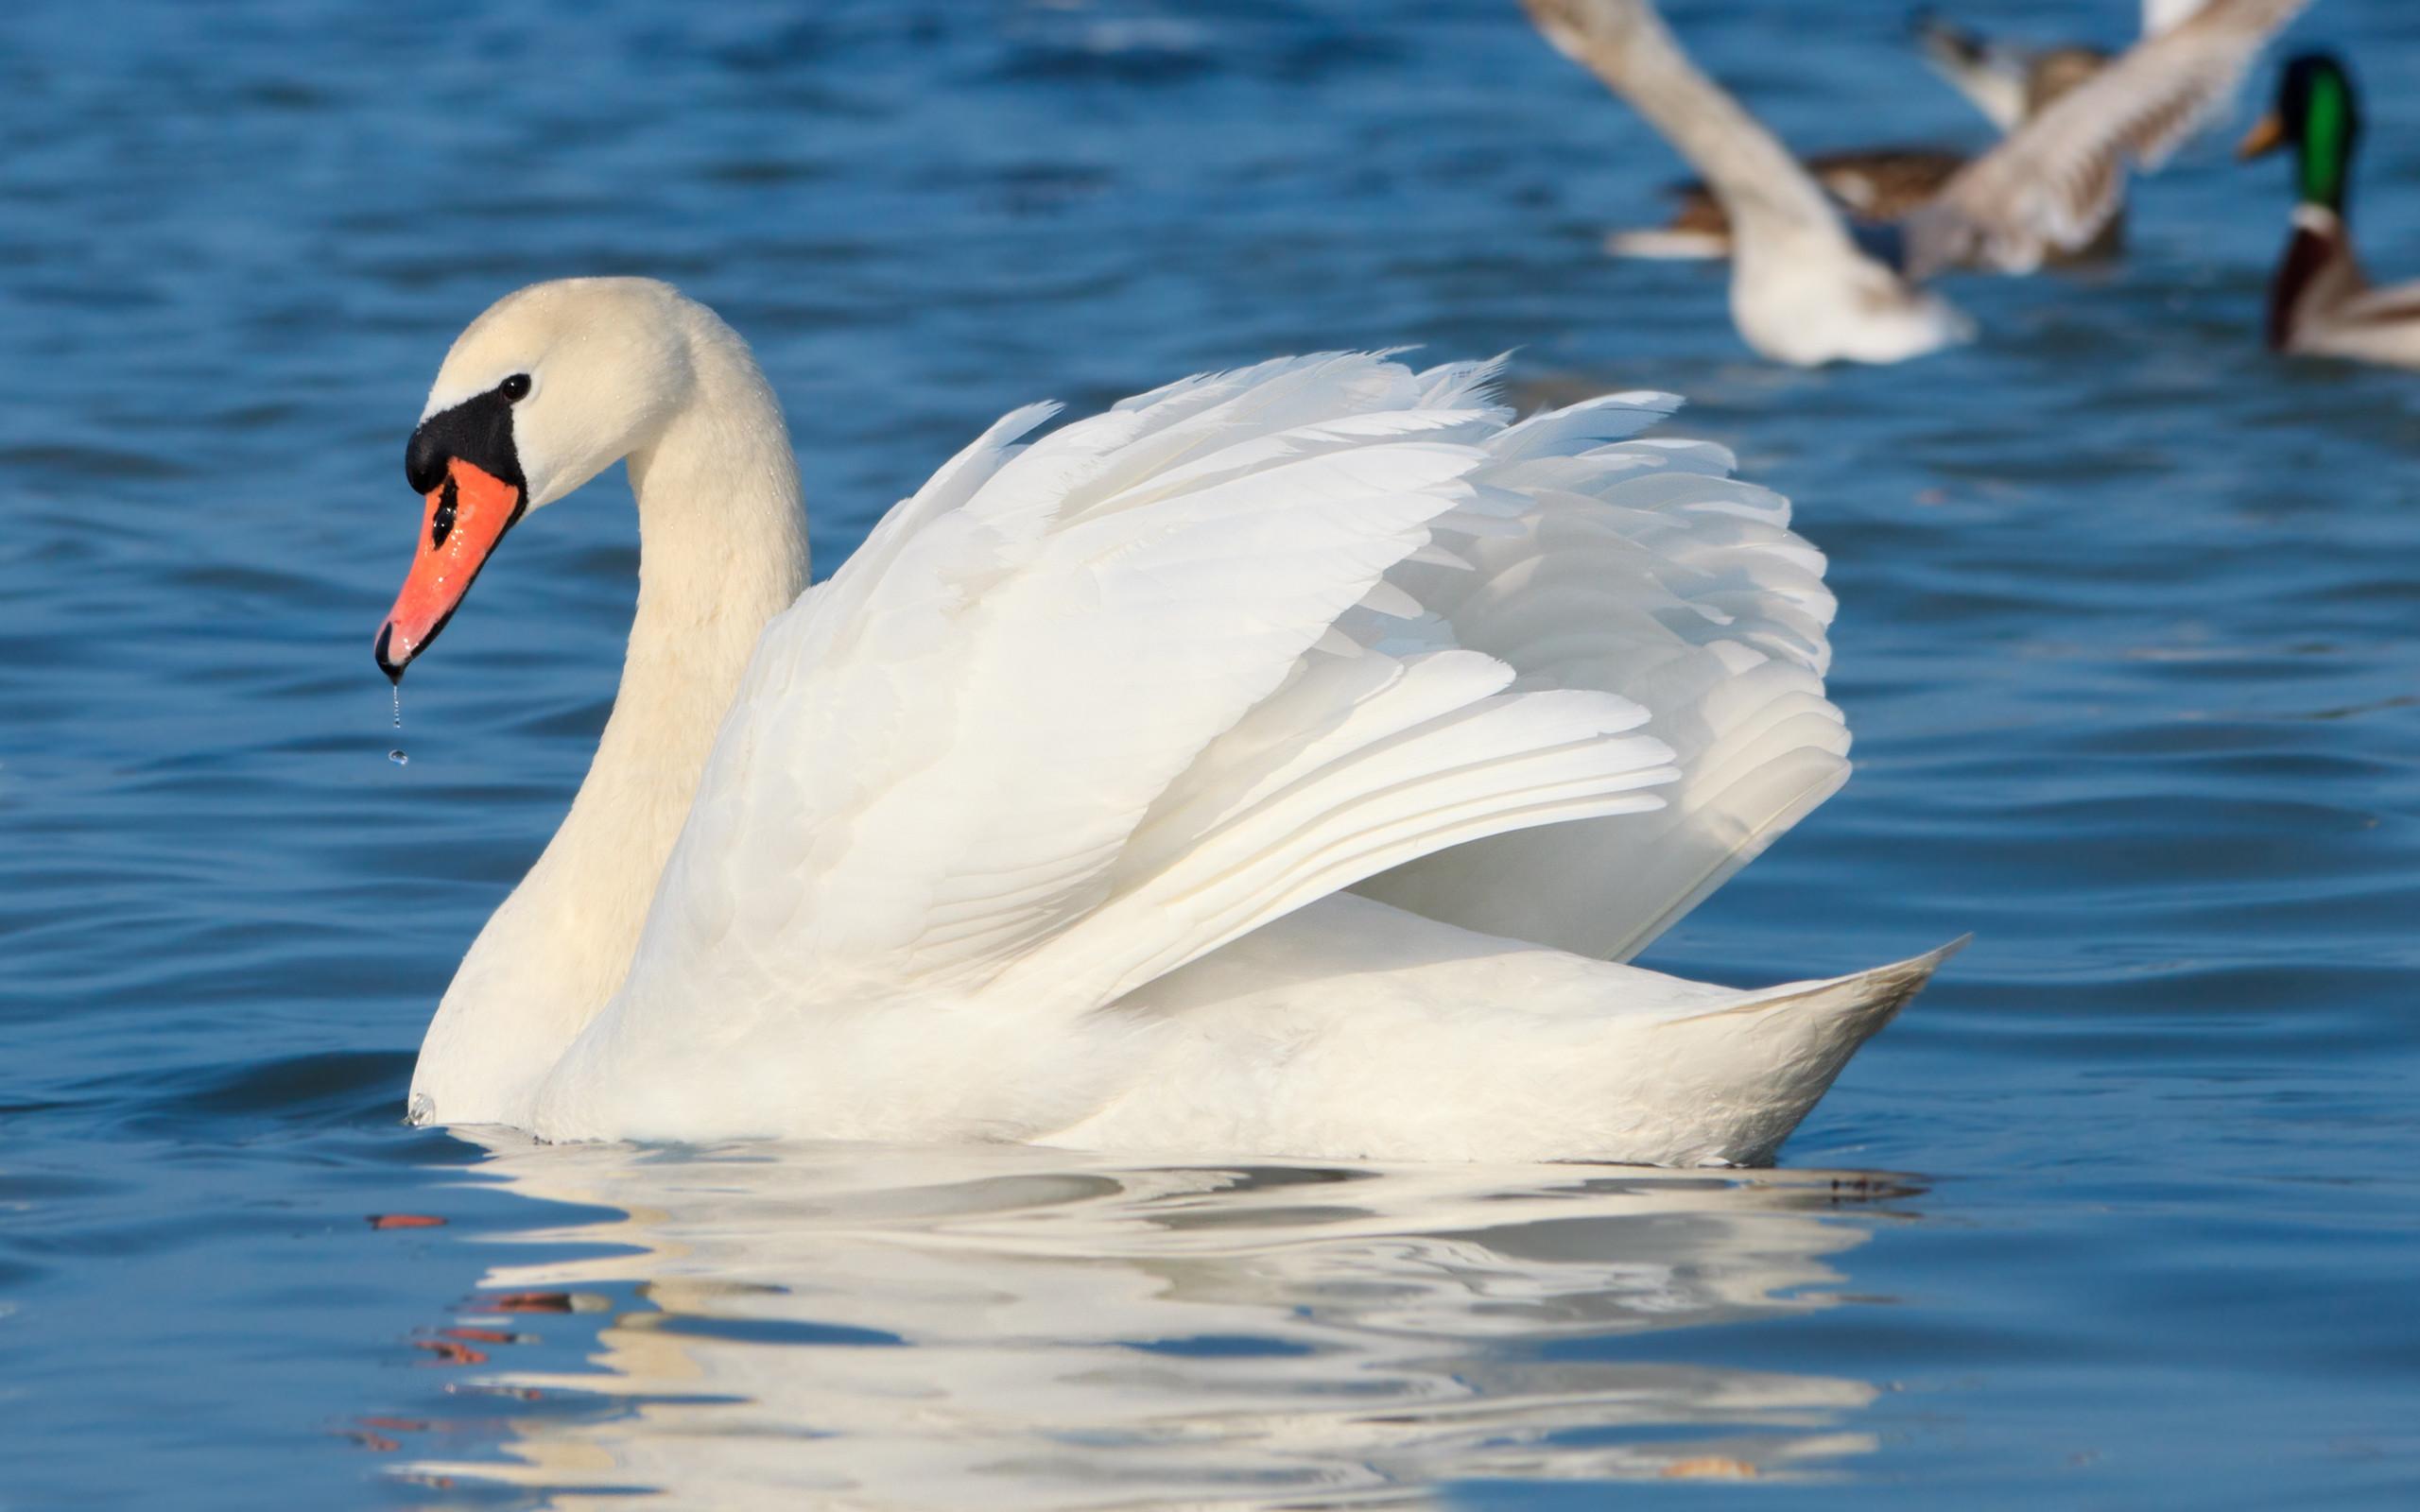 Res: 2560x1600, Mute swan Wallpaper 22 - 2560 X 1600